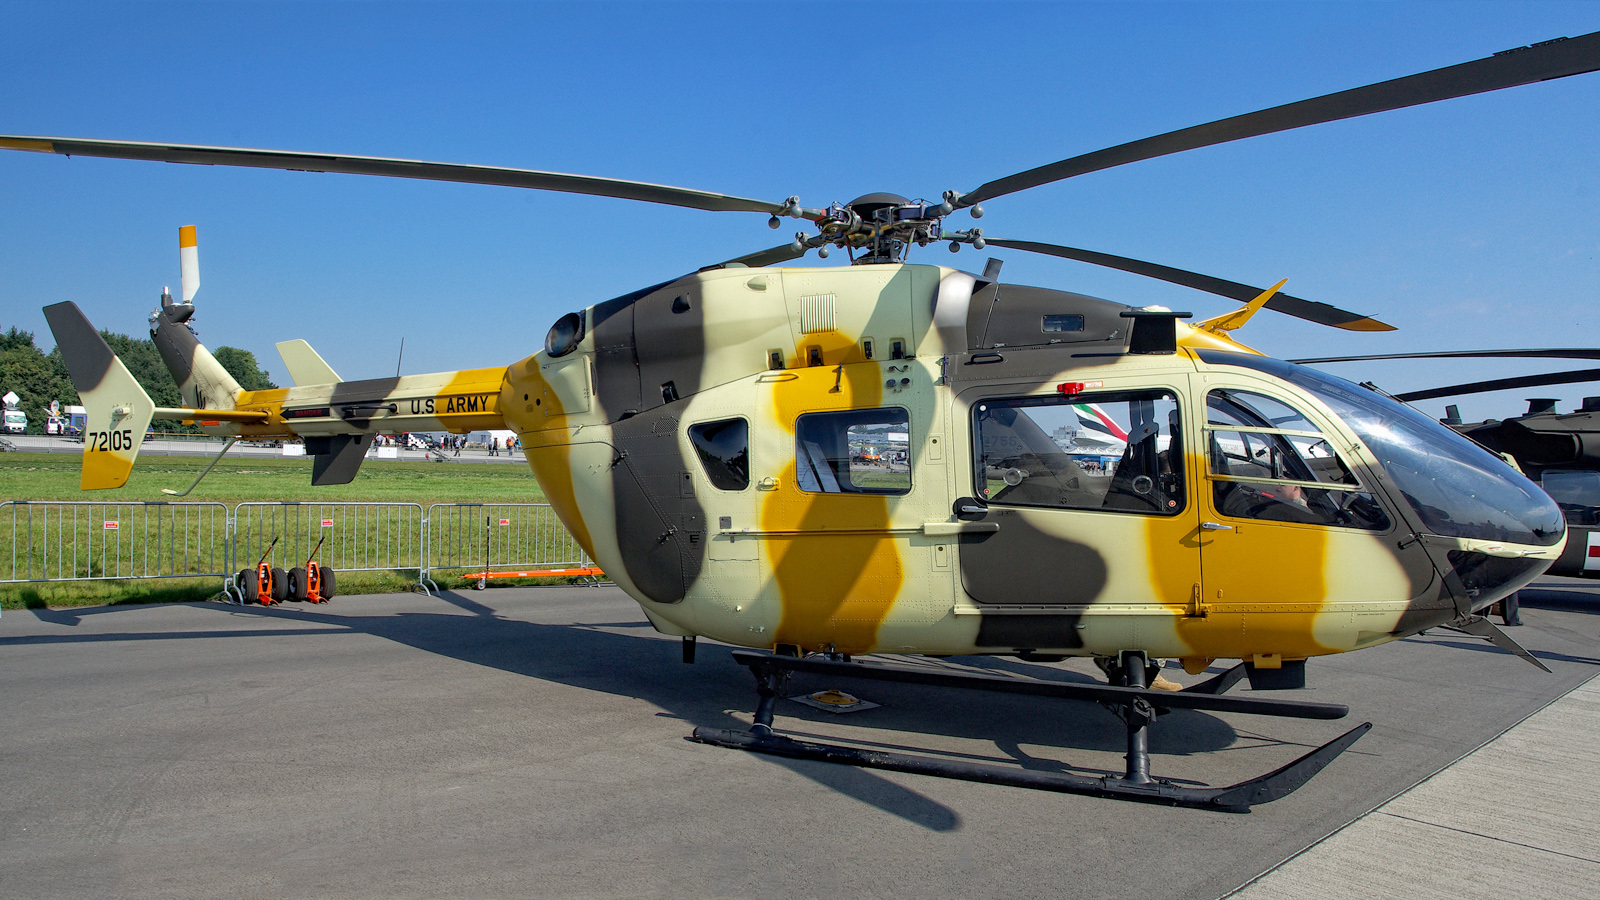 Eurocopter-Kawasaki UH-72A Lakota EC-145 09-72105